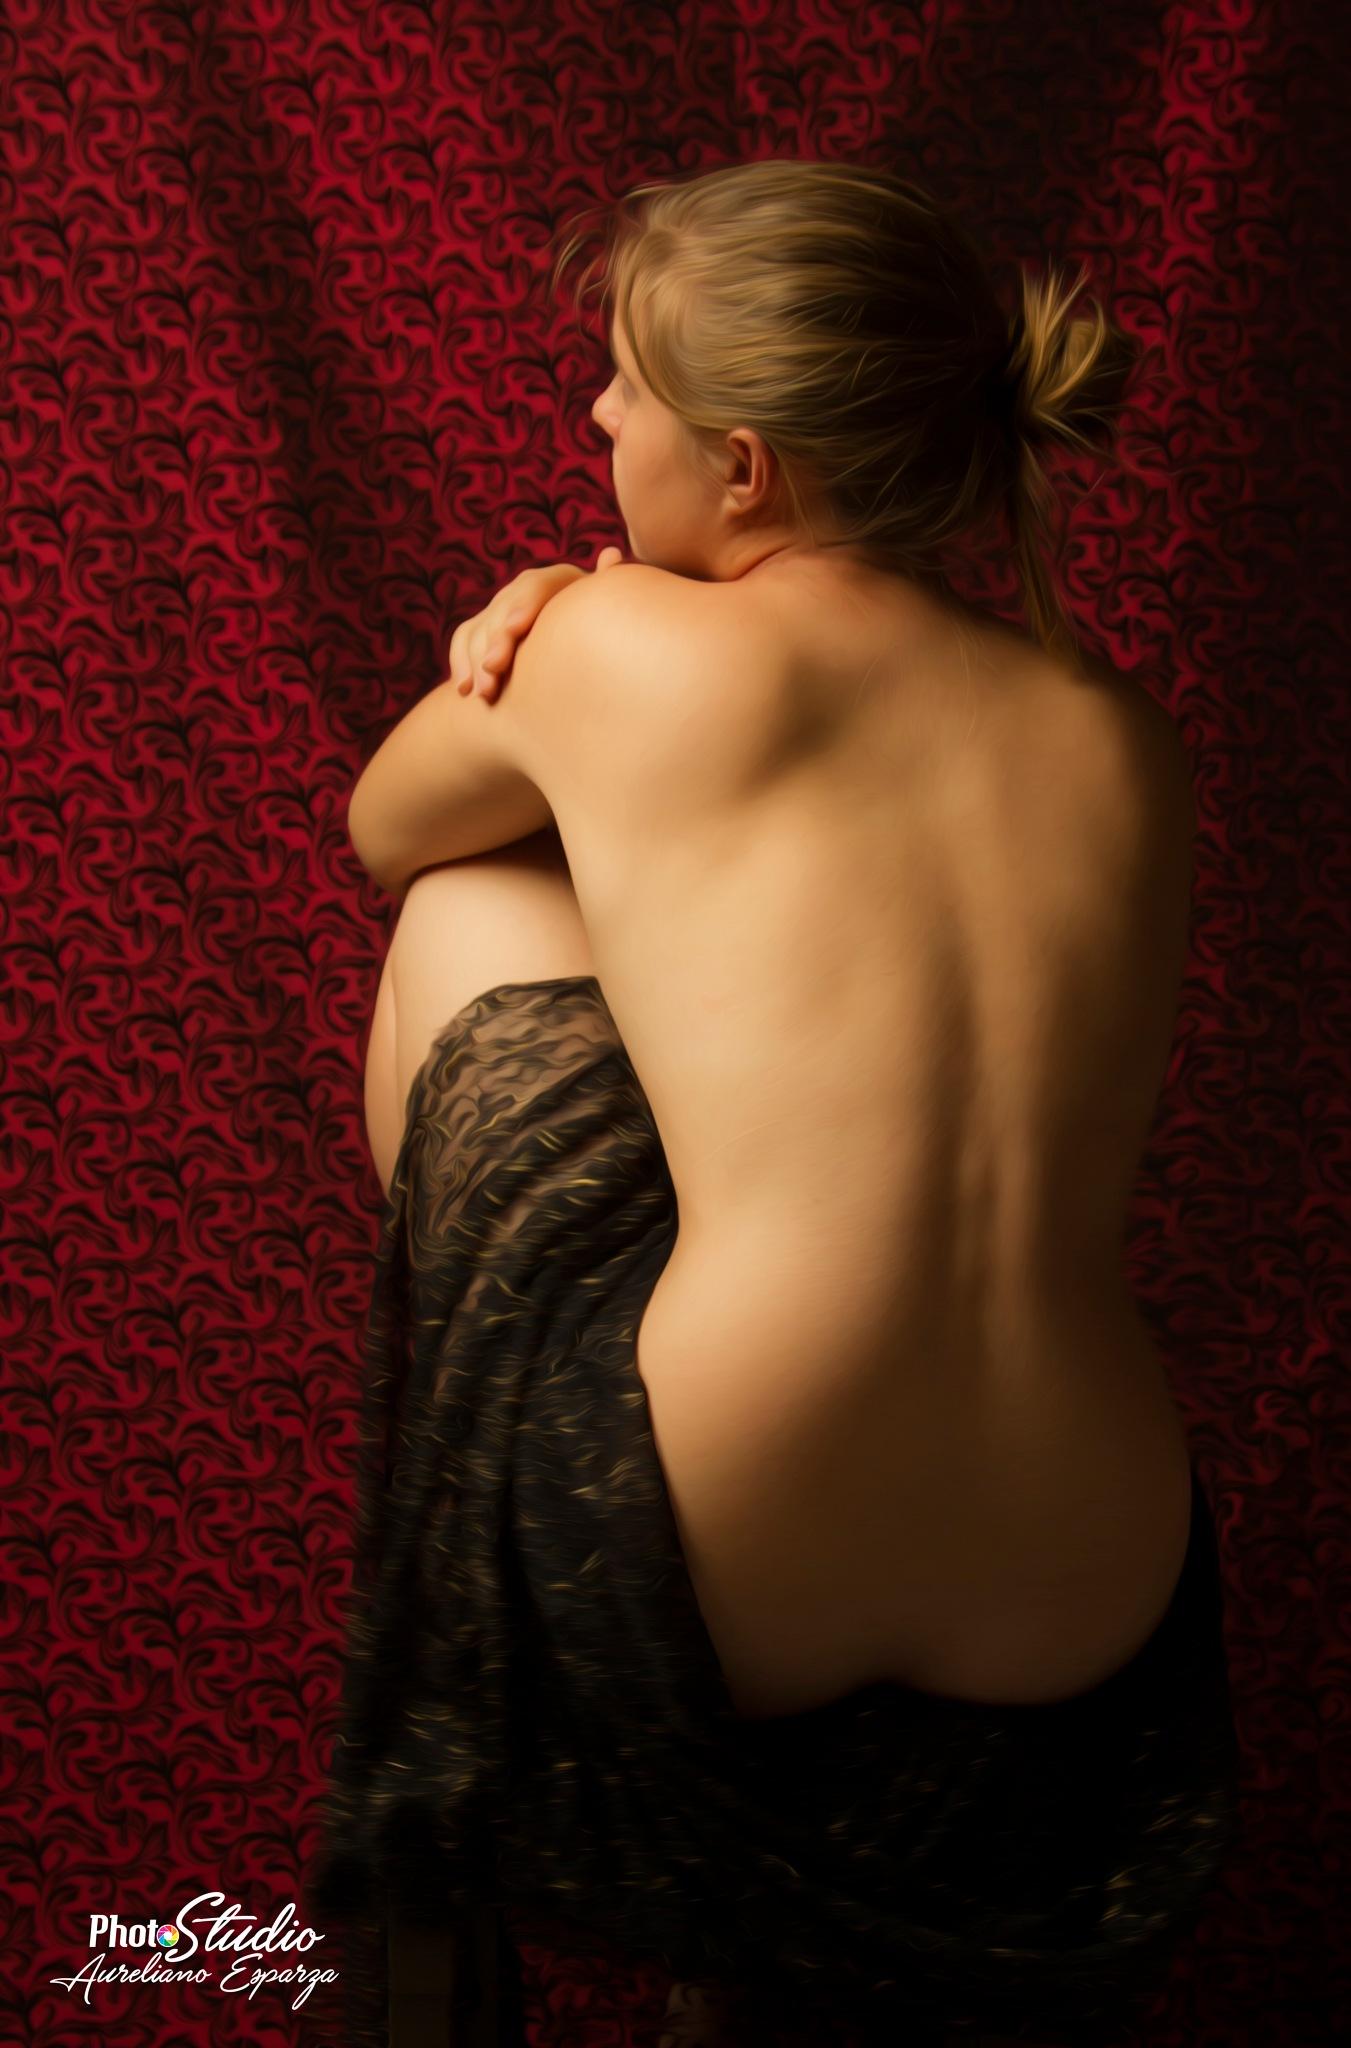 Untitled by Photo Studio Aureliano Esparza